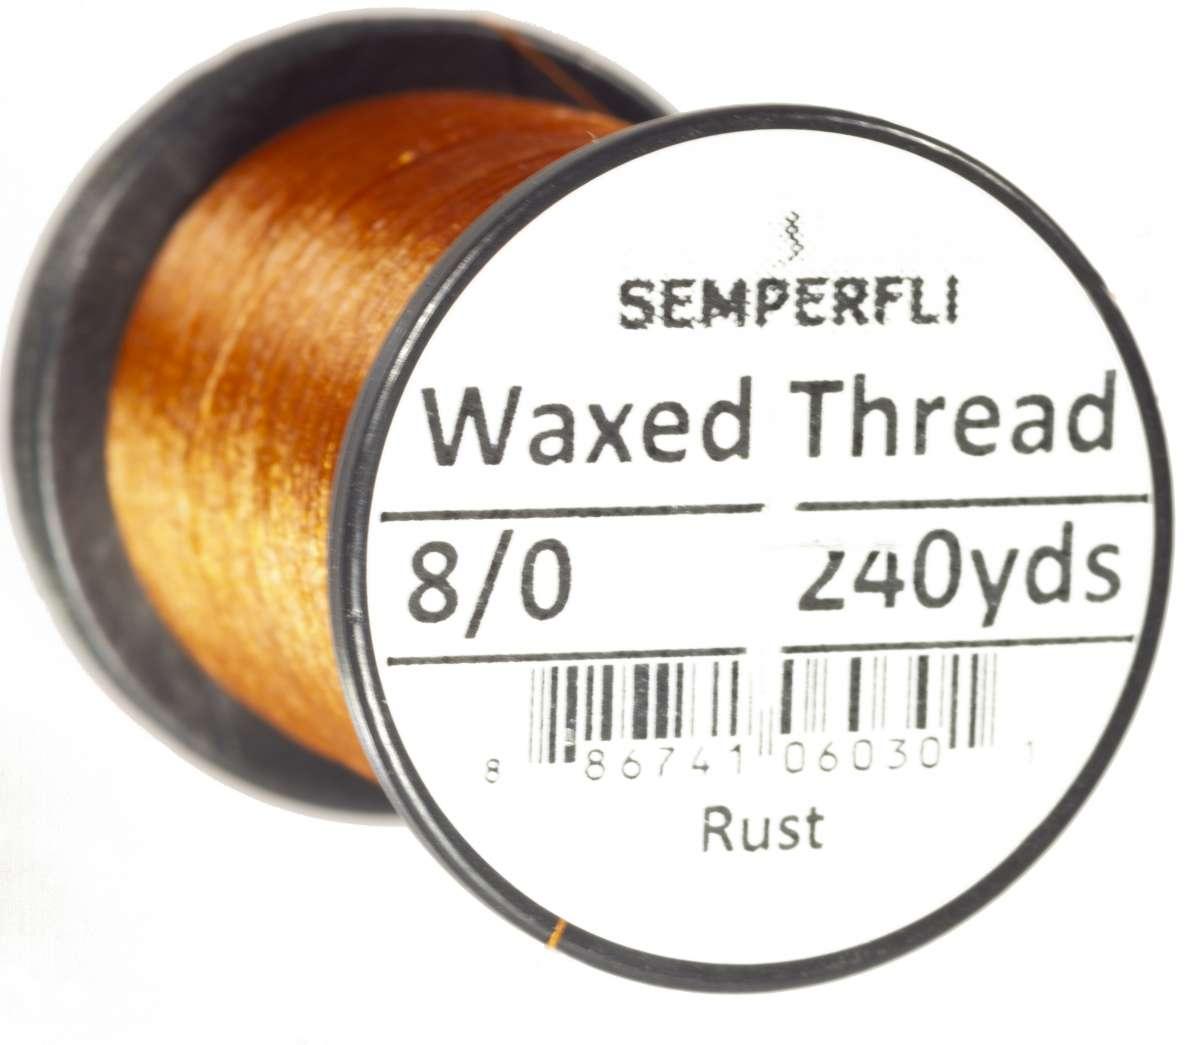 8/0 Classic Waxed Thread Rust sem-0400-1064